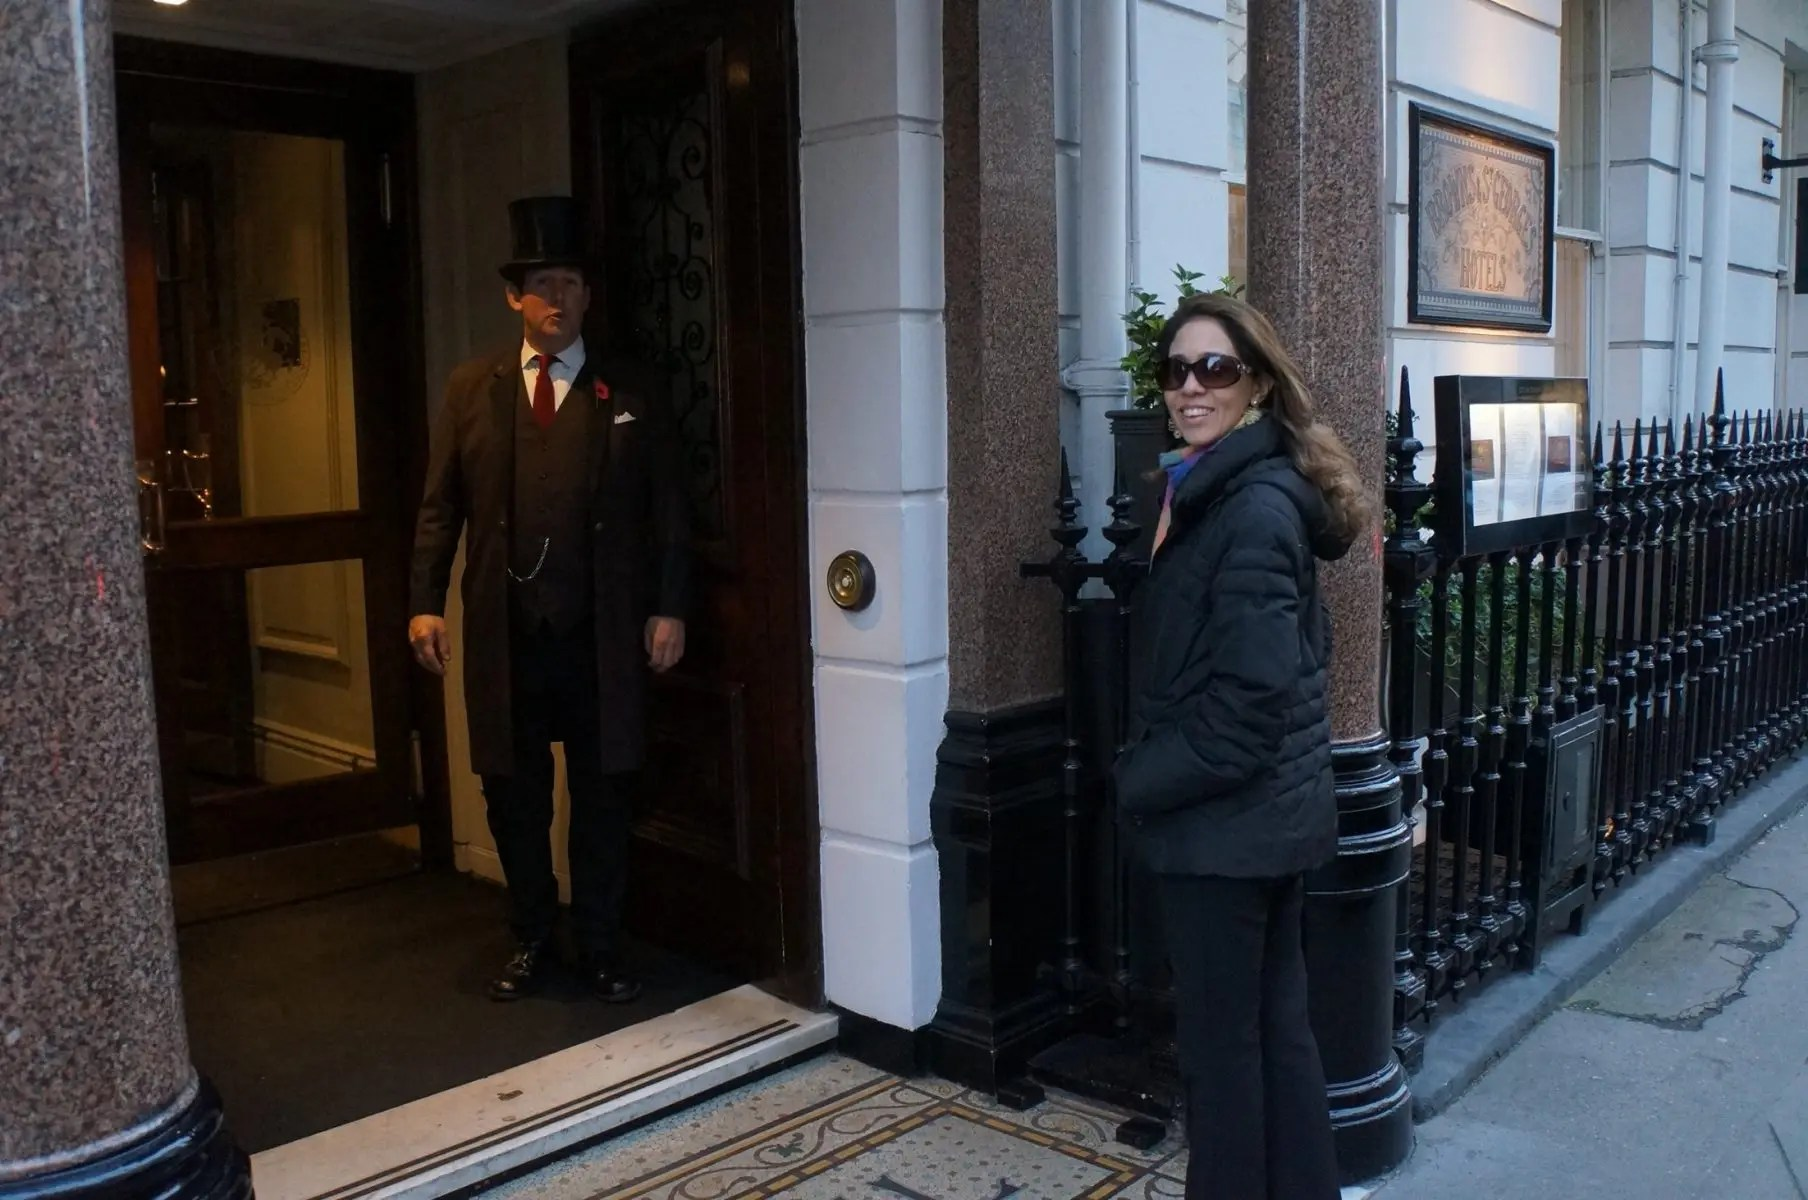 A Jornalista Adriana Reis na entrada do Hotel Brown's